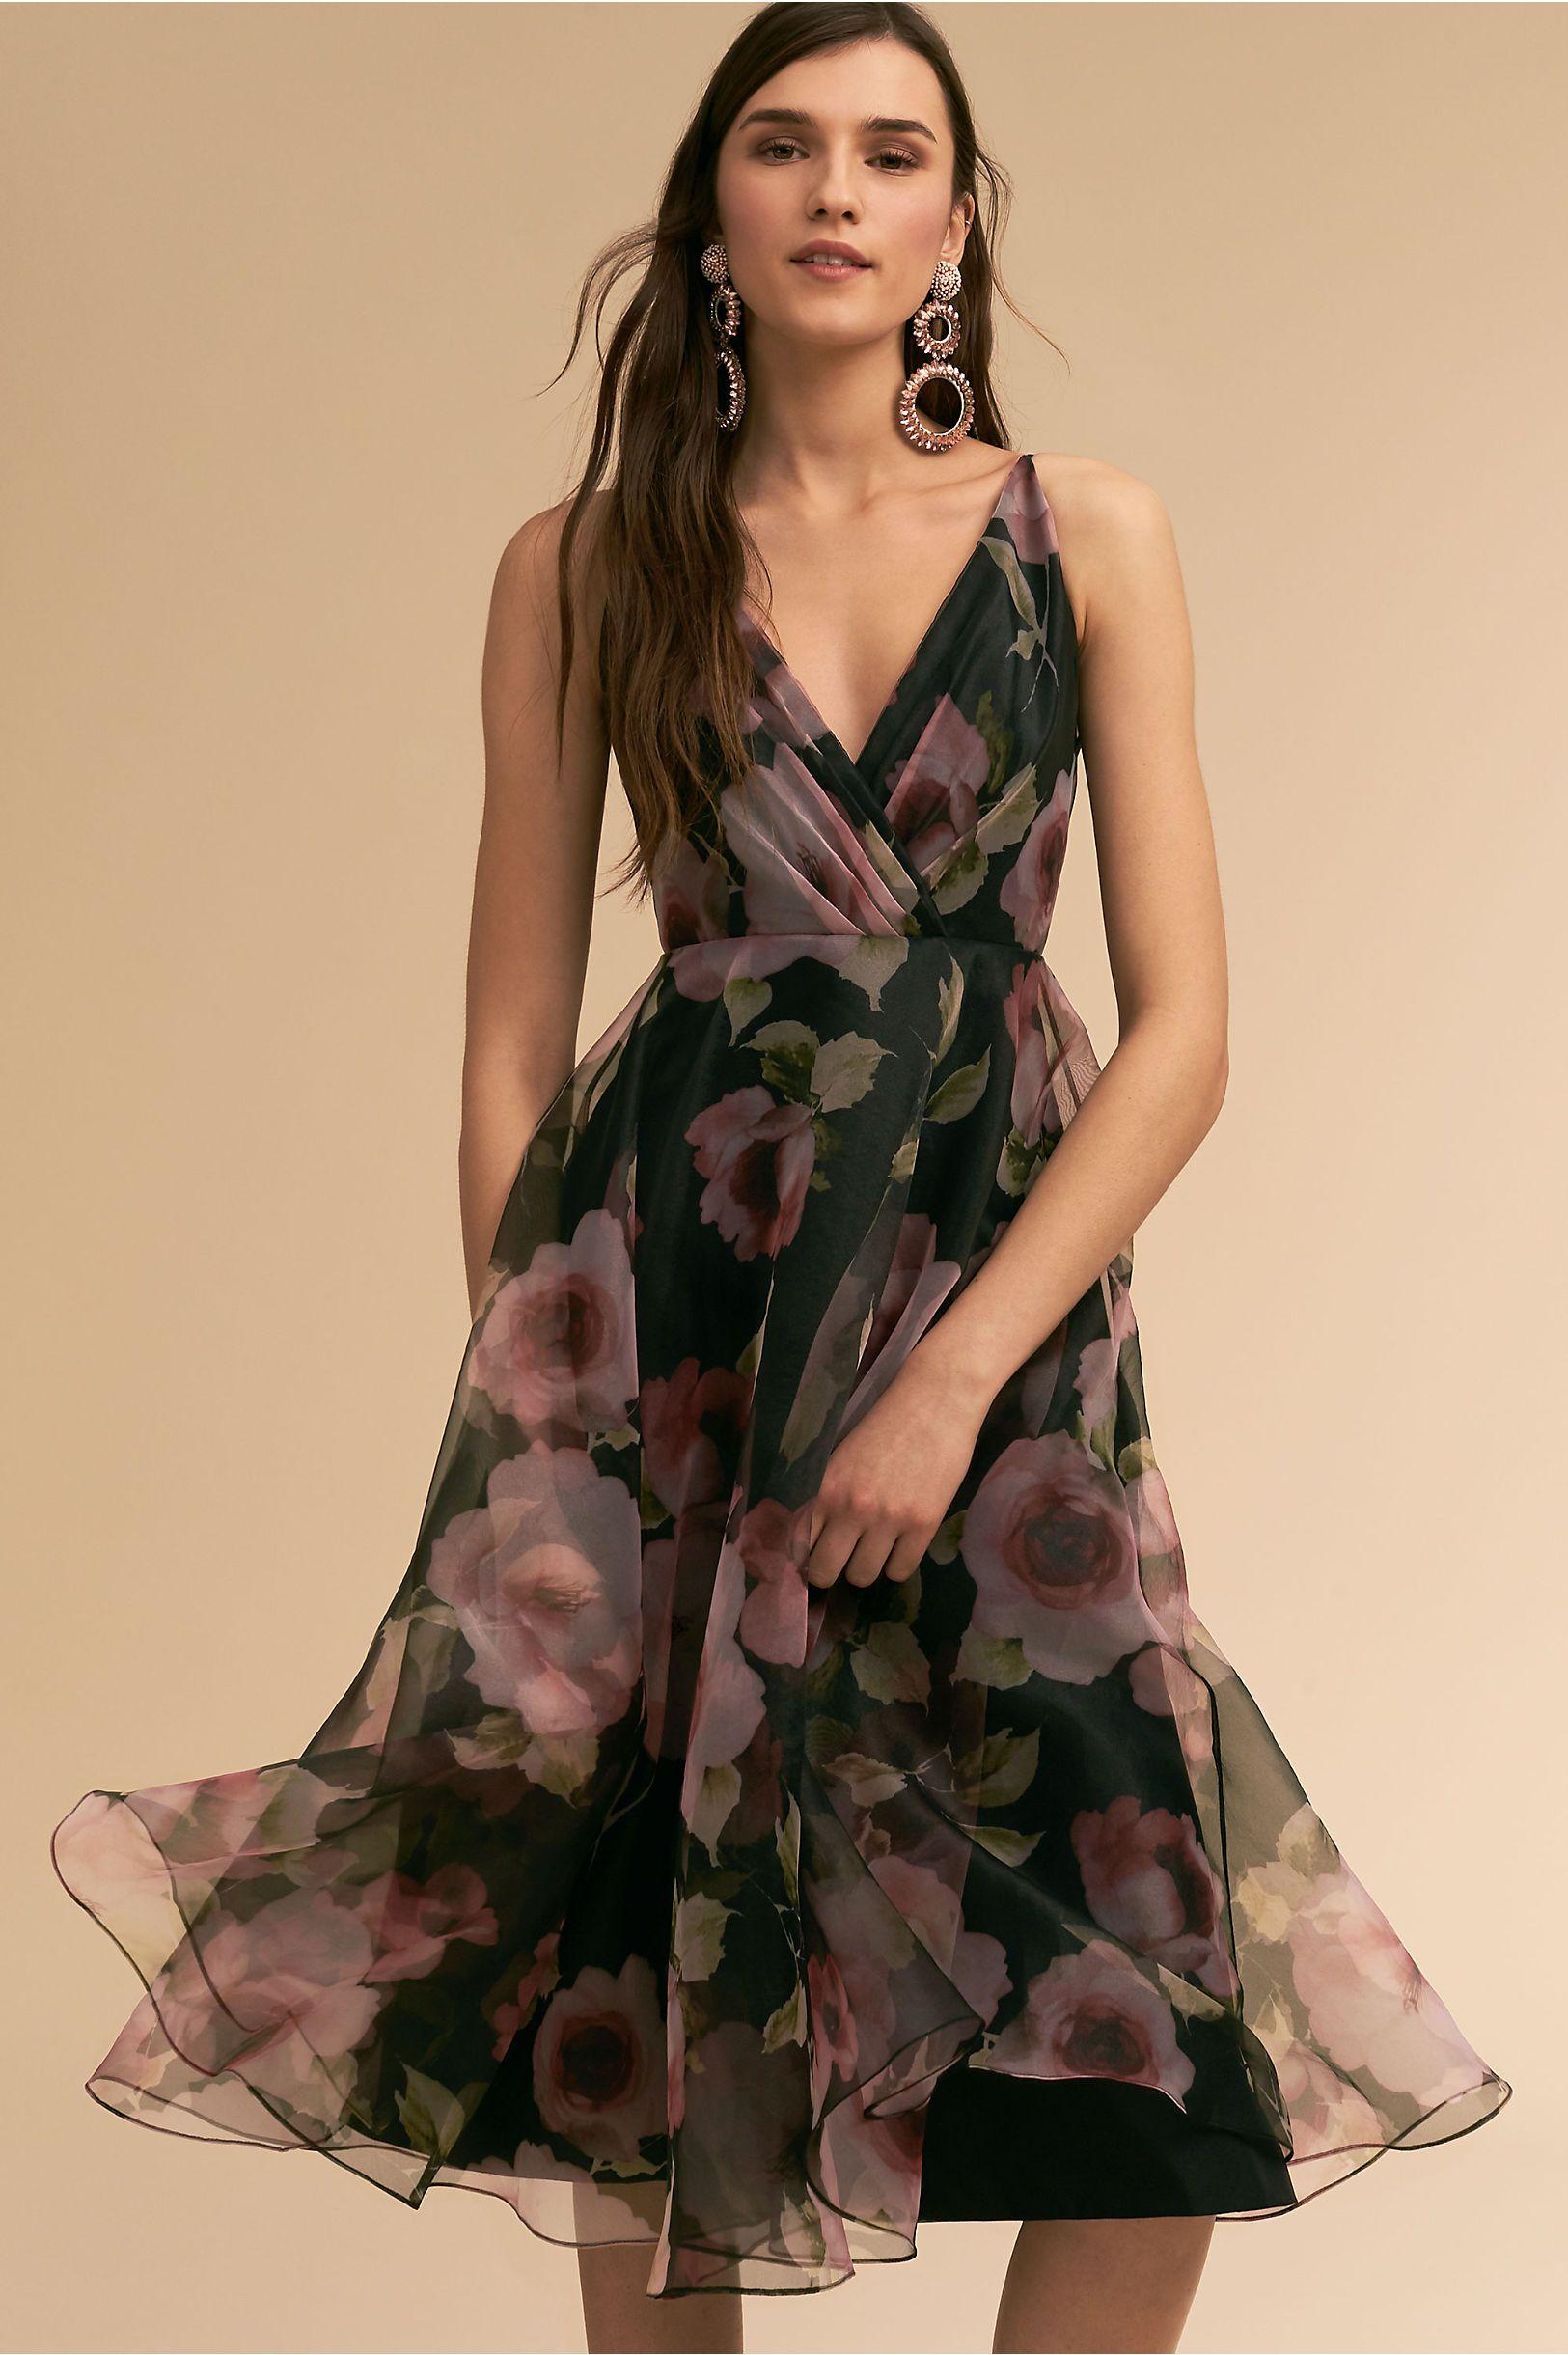 Bhldnus jenny yoo sabrina dress in black floral products